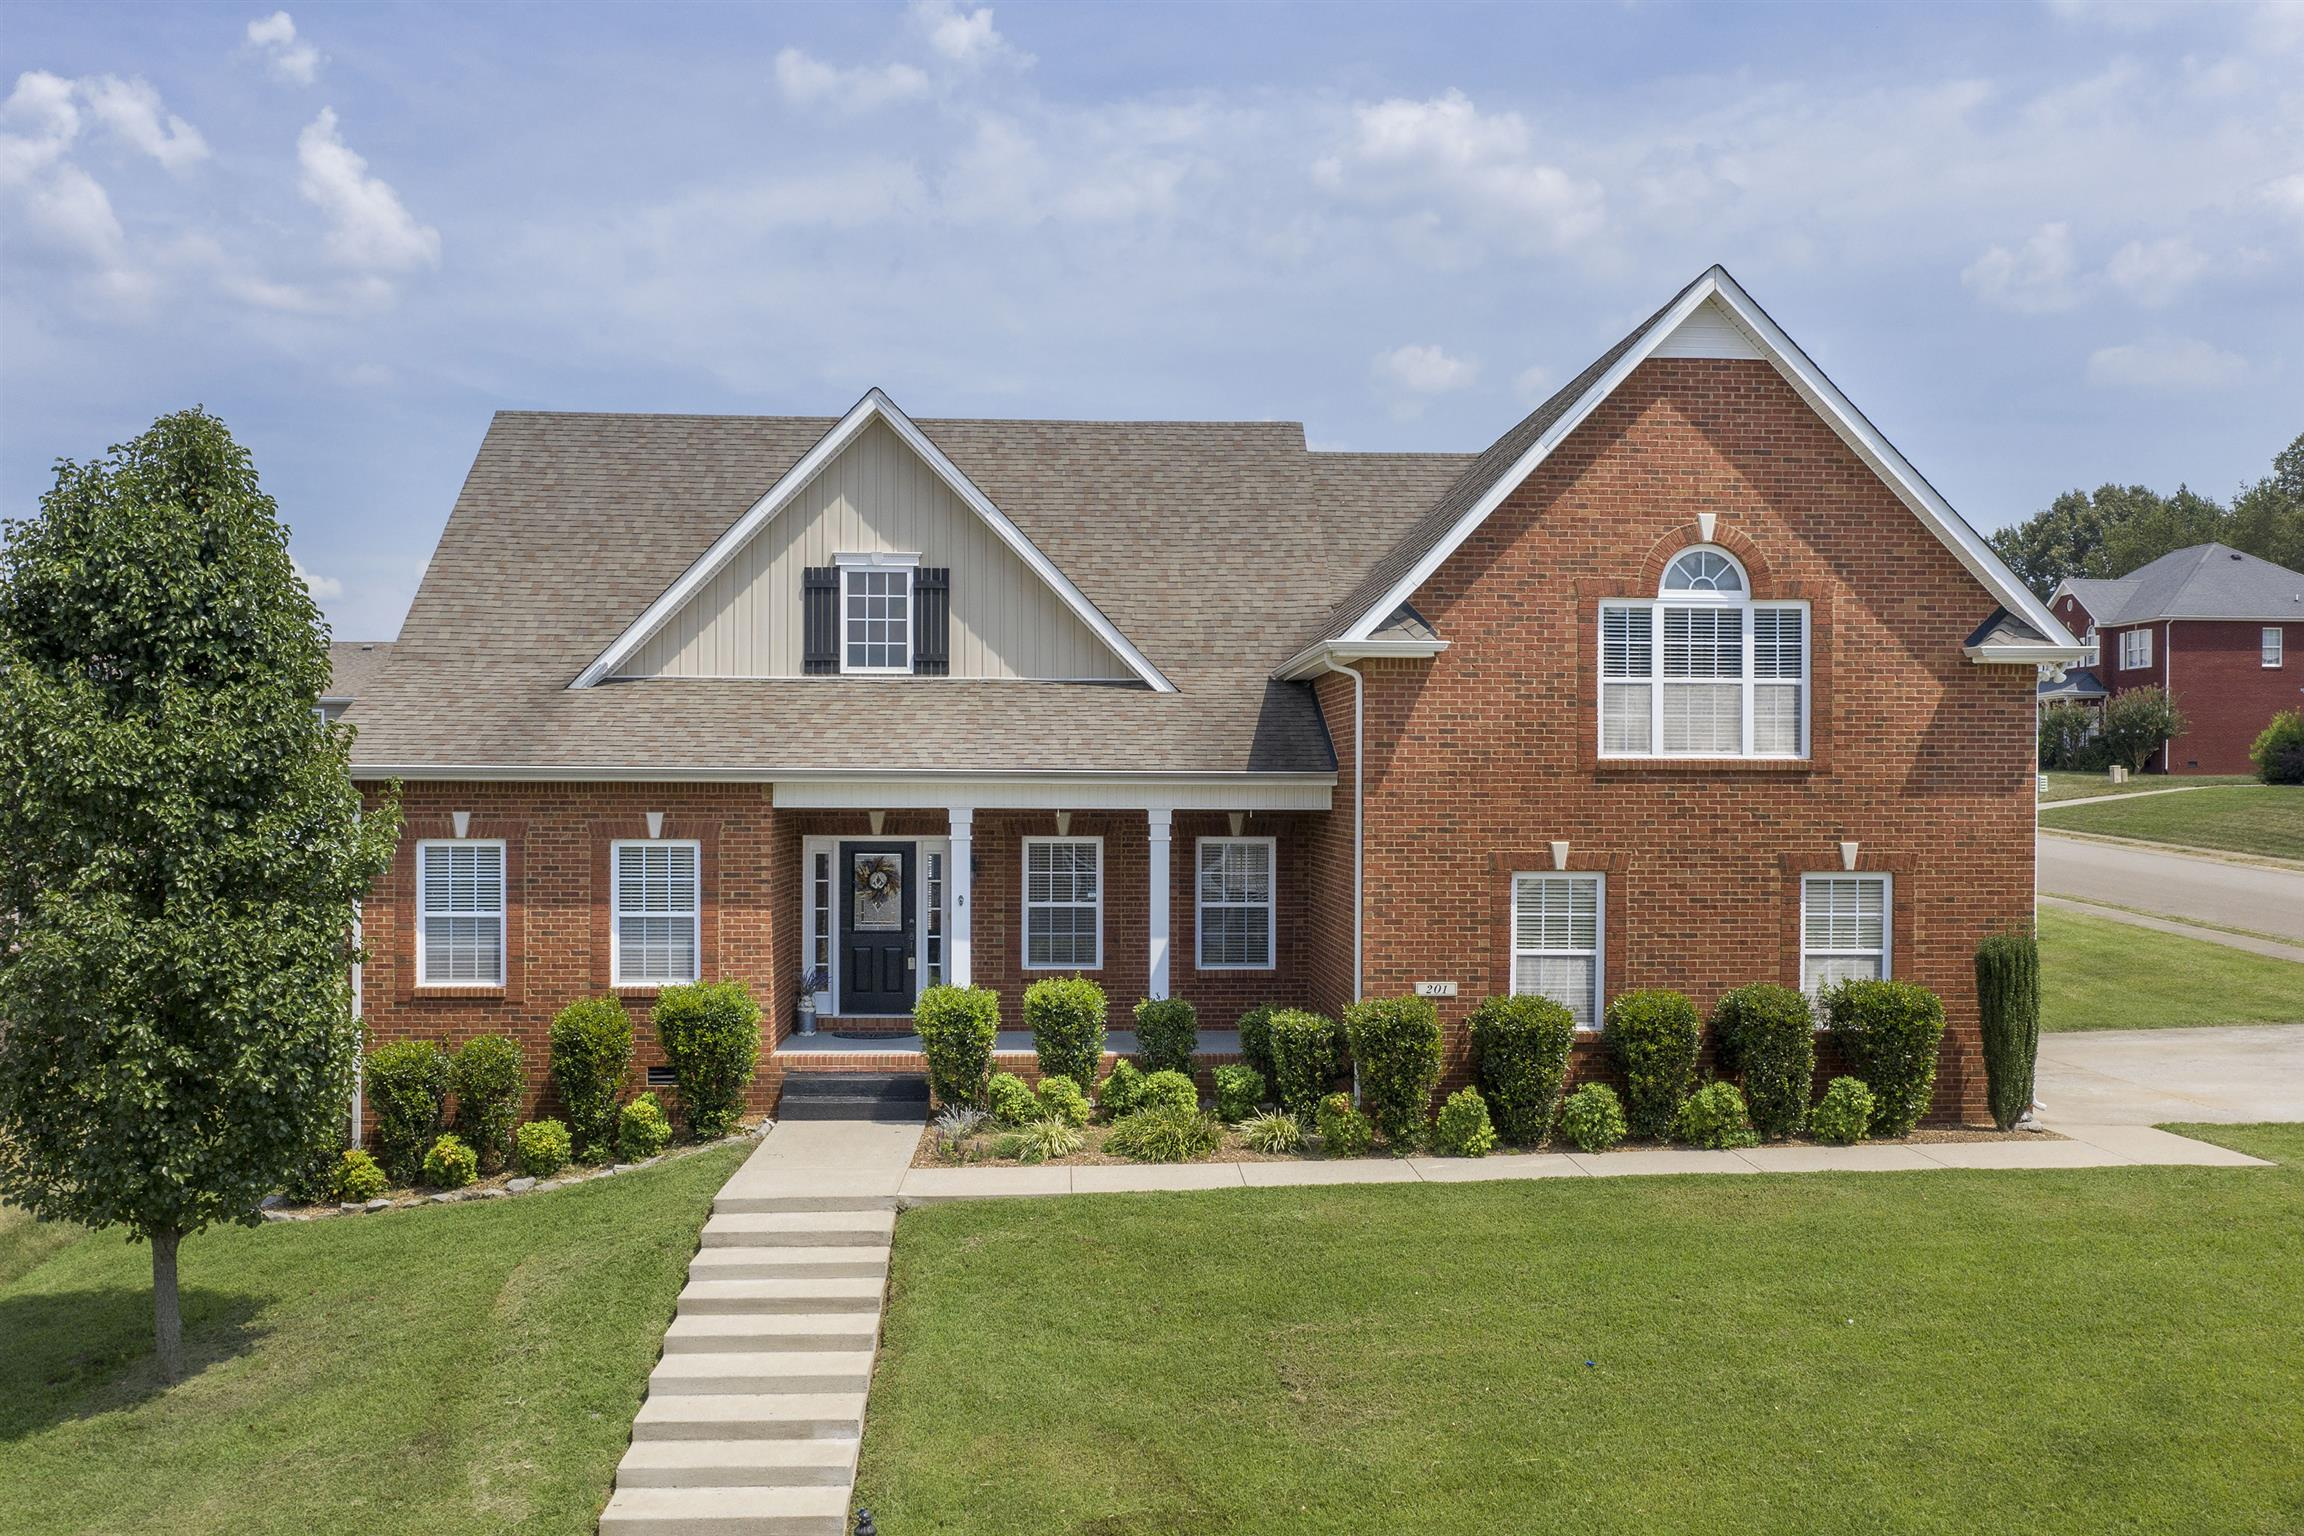 201 Spring Terrace Ln, Clarksville, TN 37040 - Clarksville, TN real estate listing